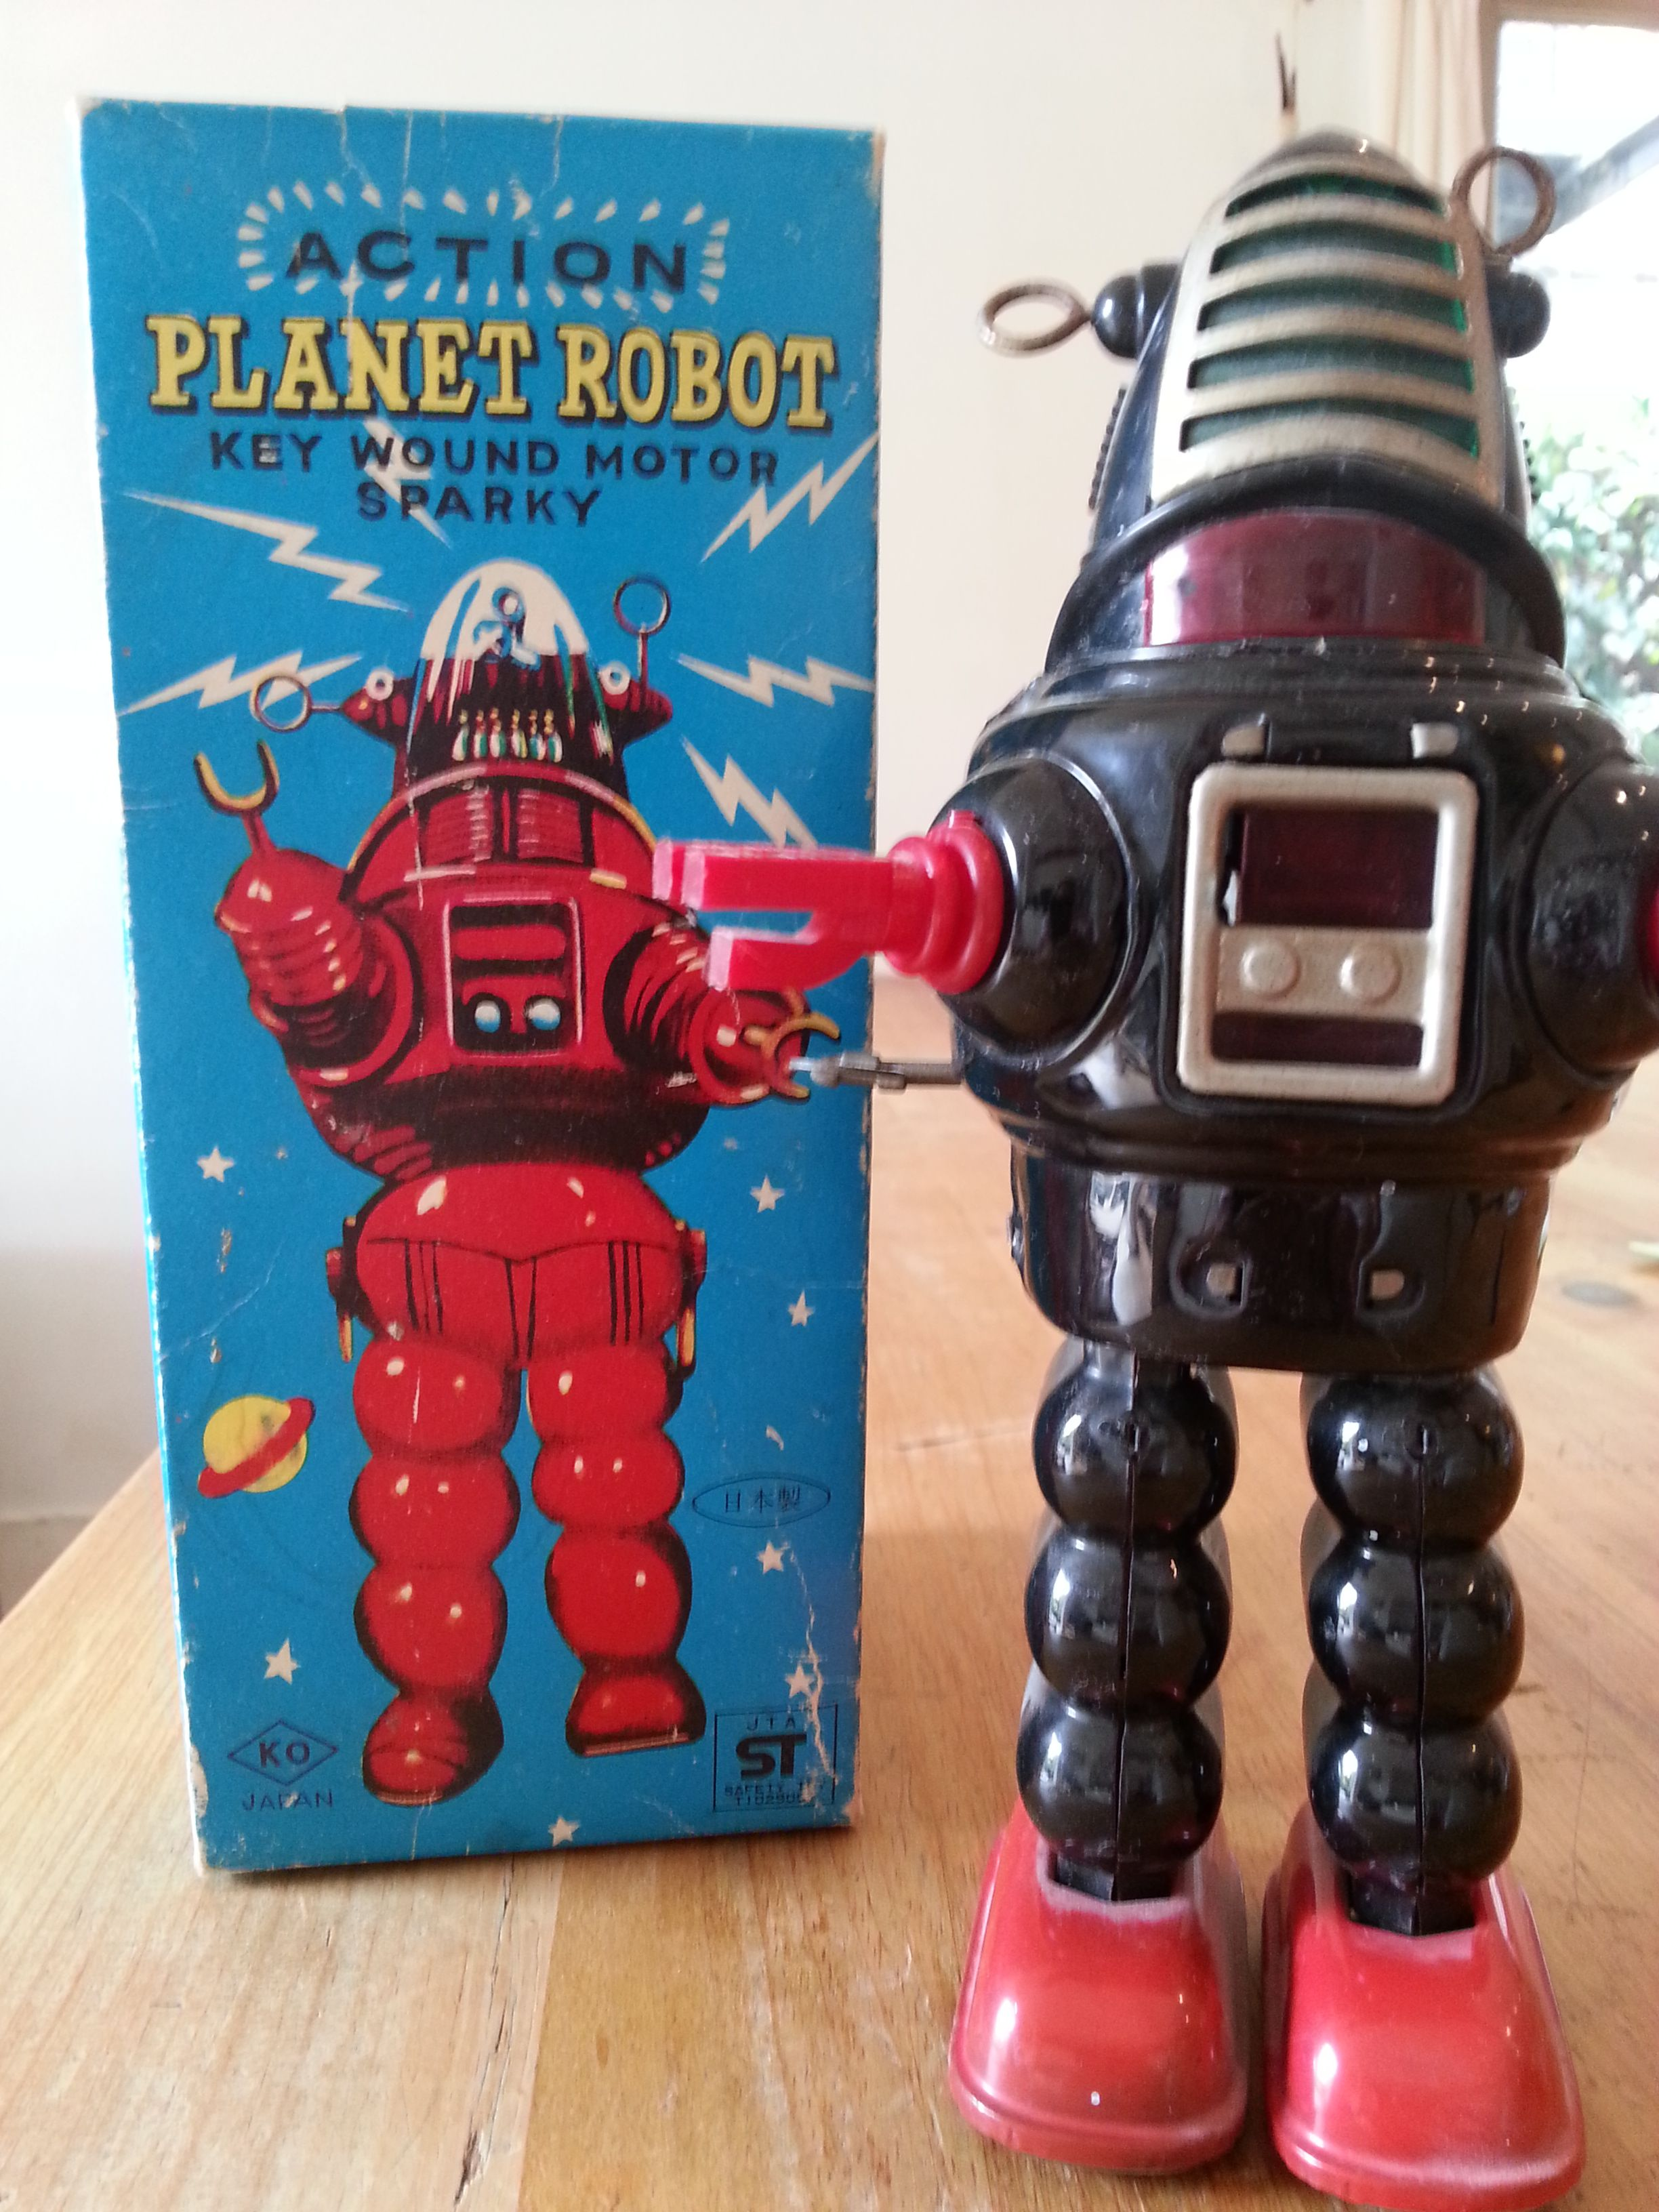 Original Robbie Robot. In 1950' Film